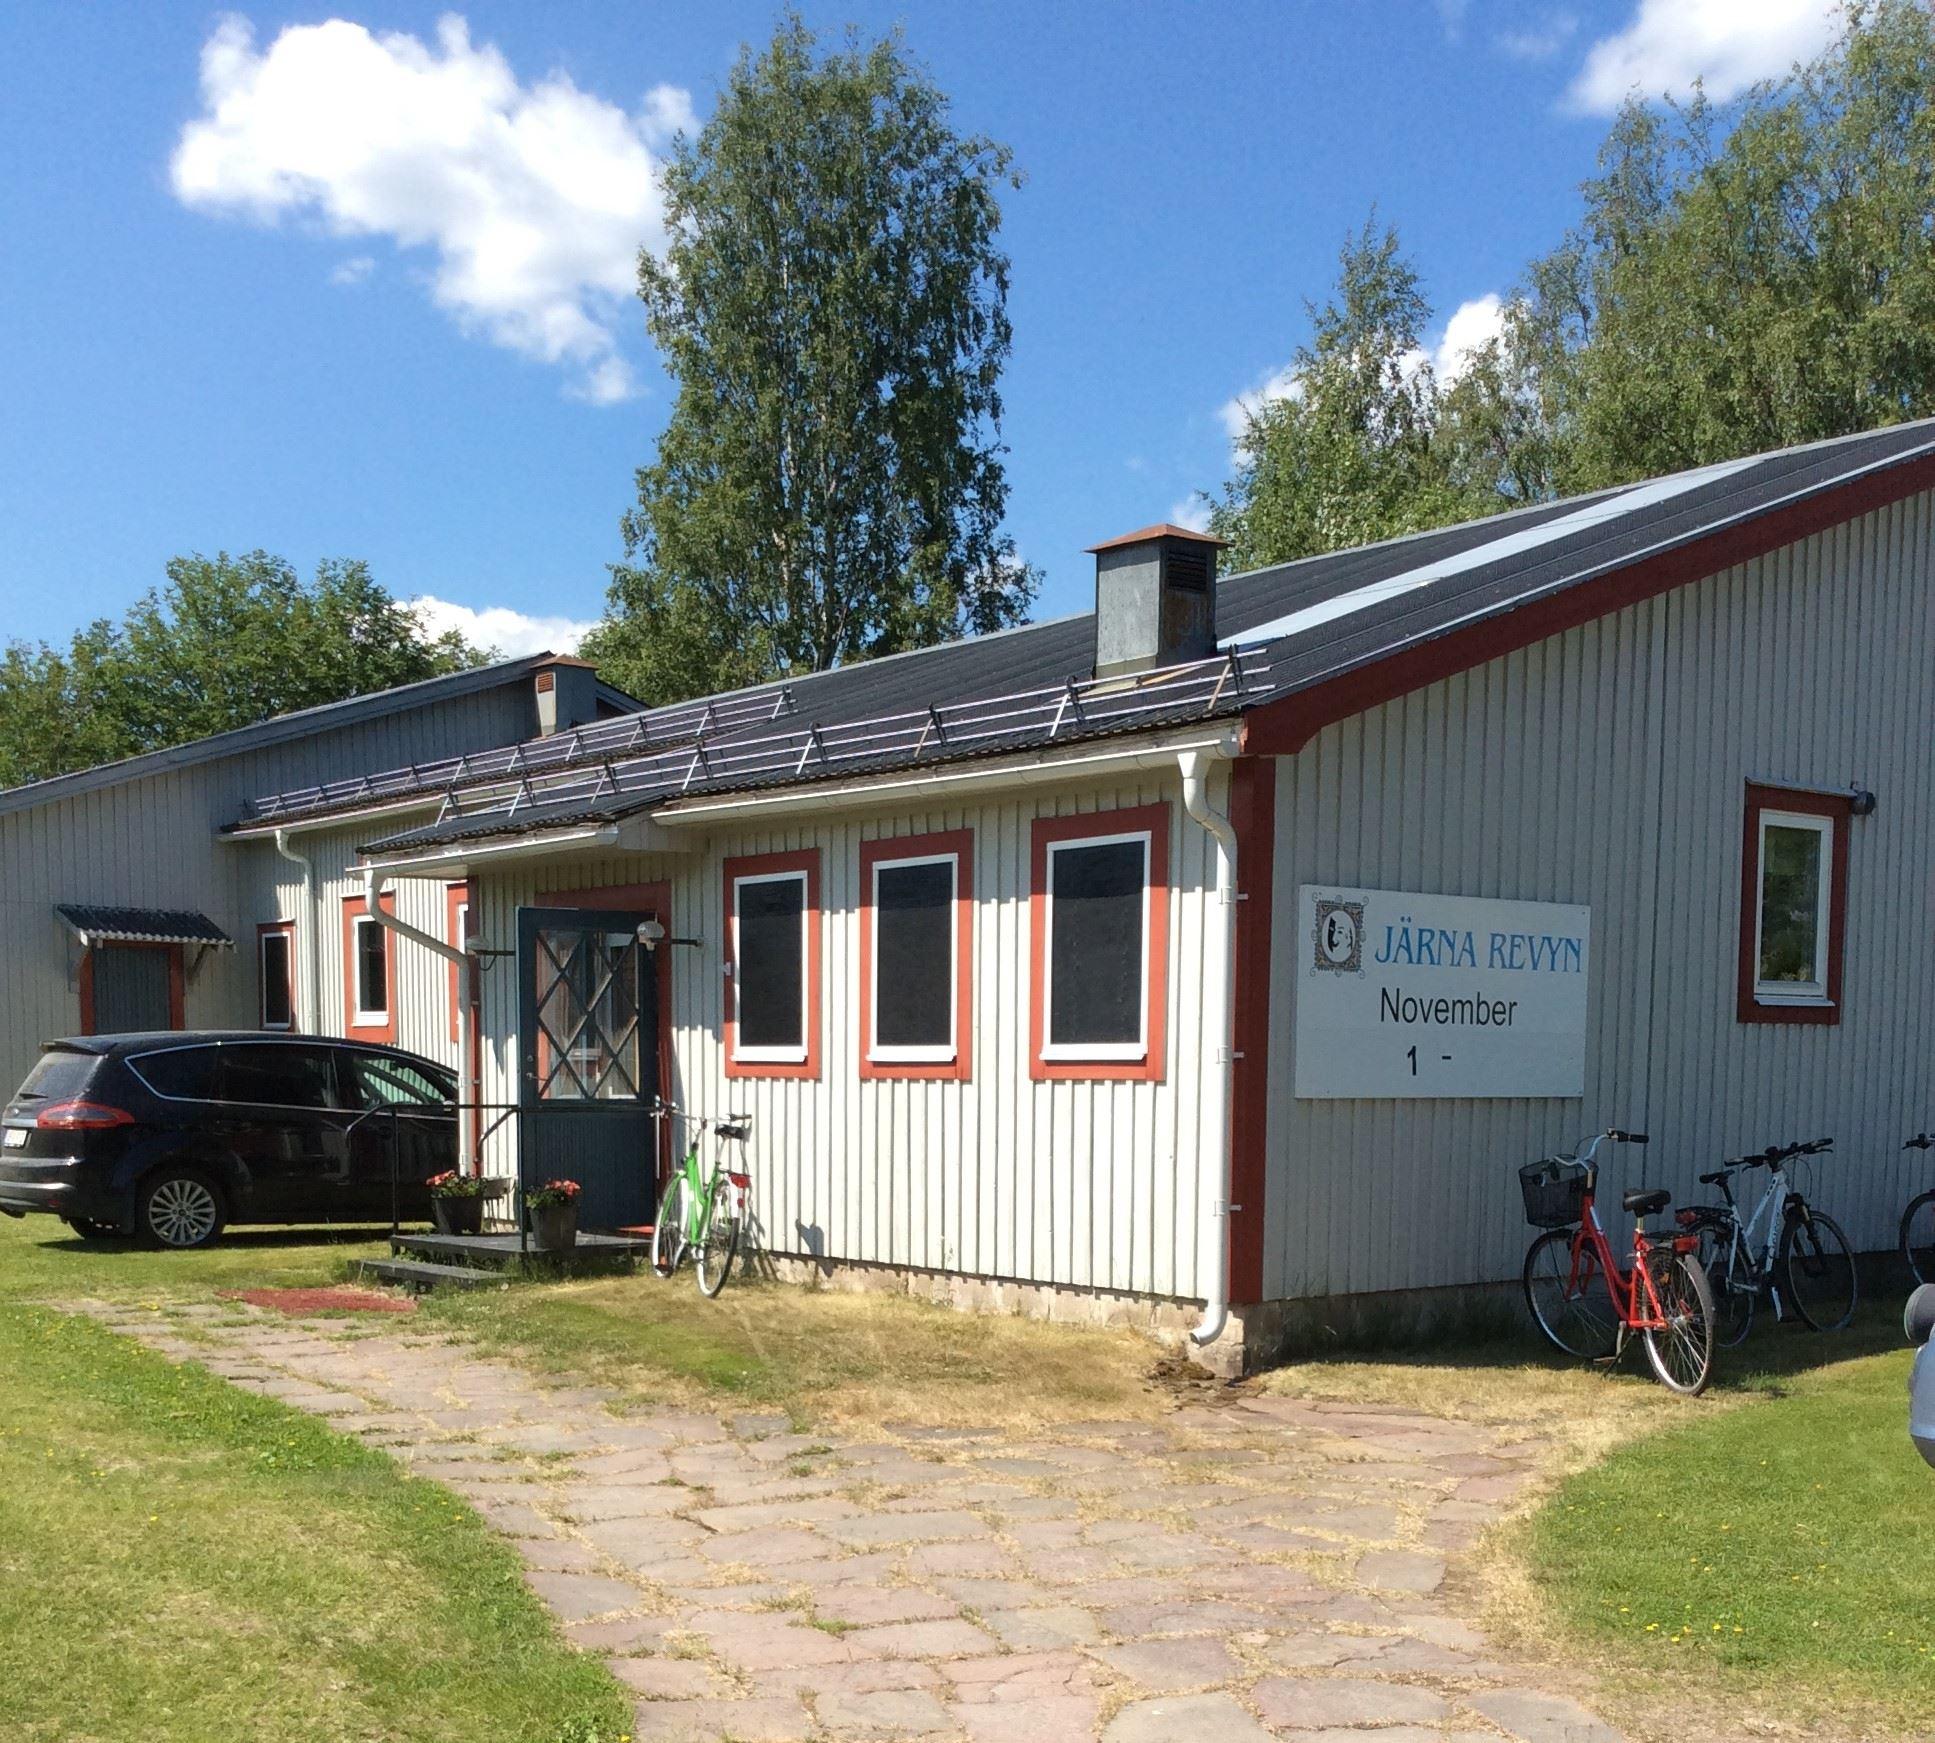 Evenemangsboende i Dala-Järna. Logi på hårt underlag.